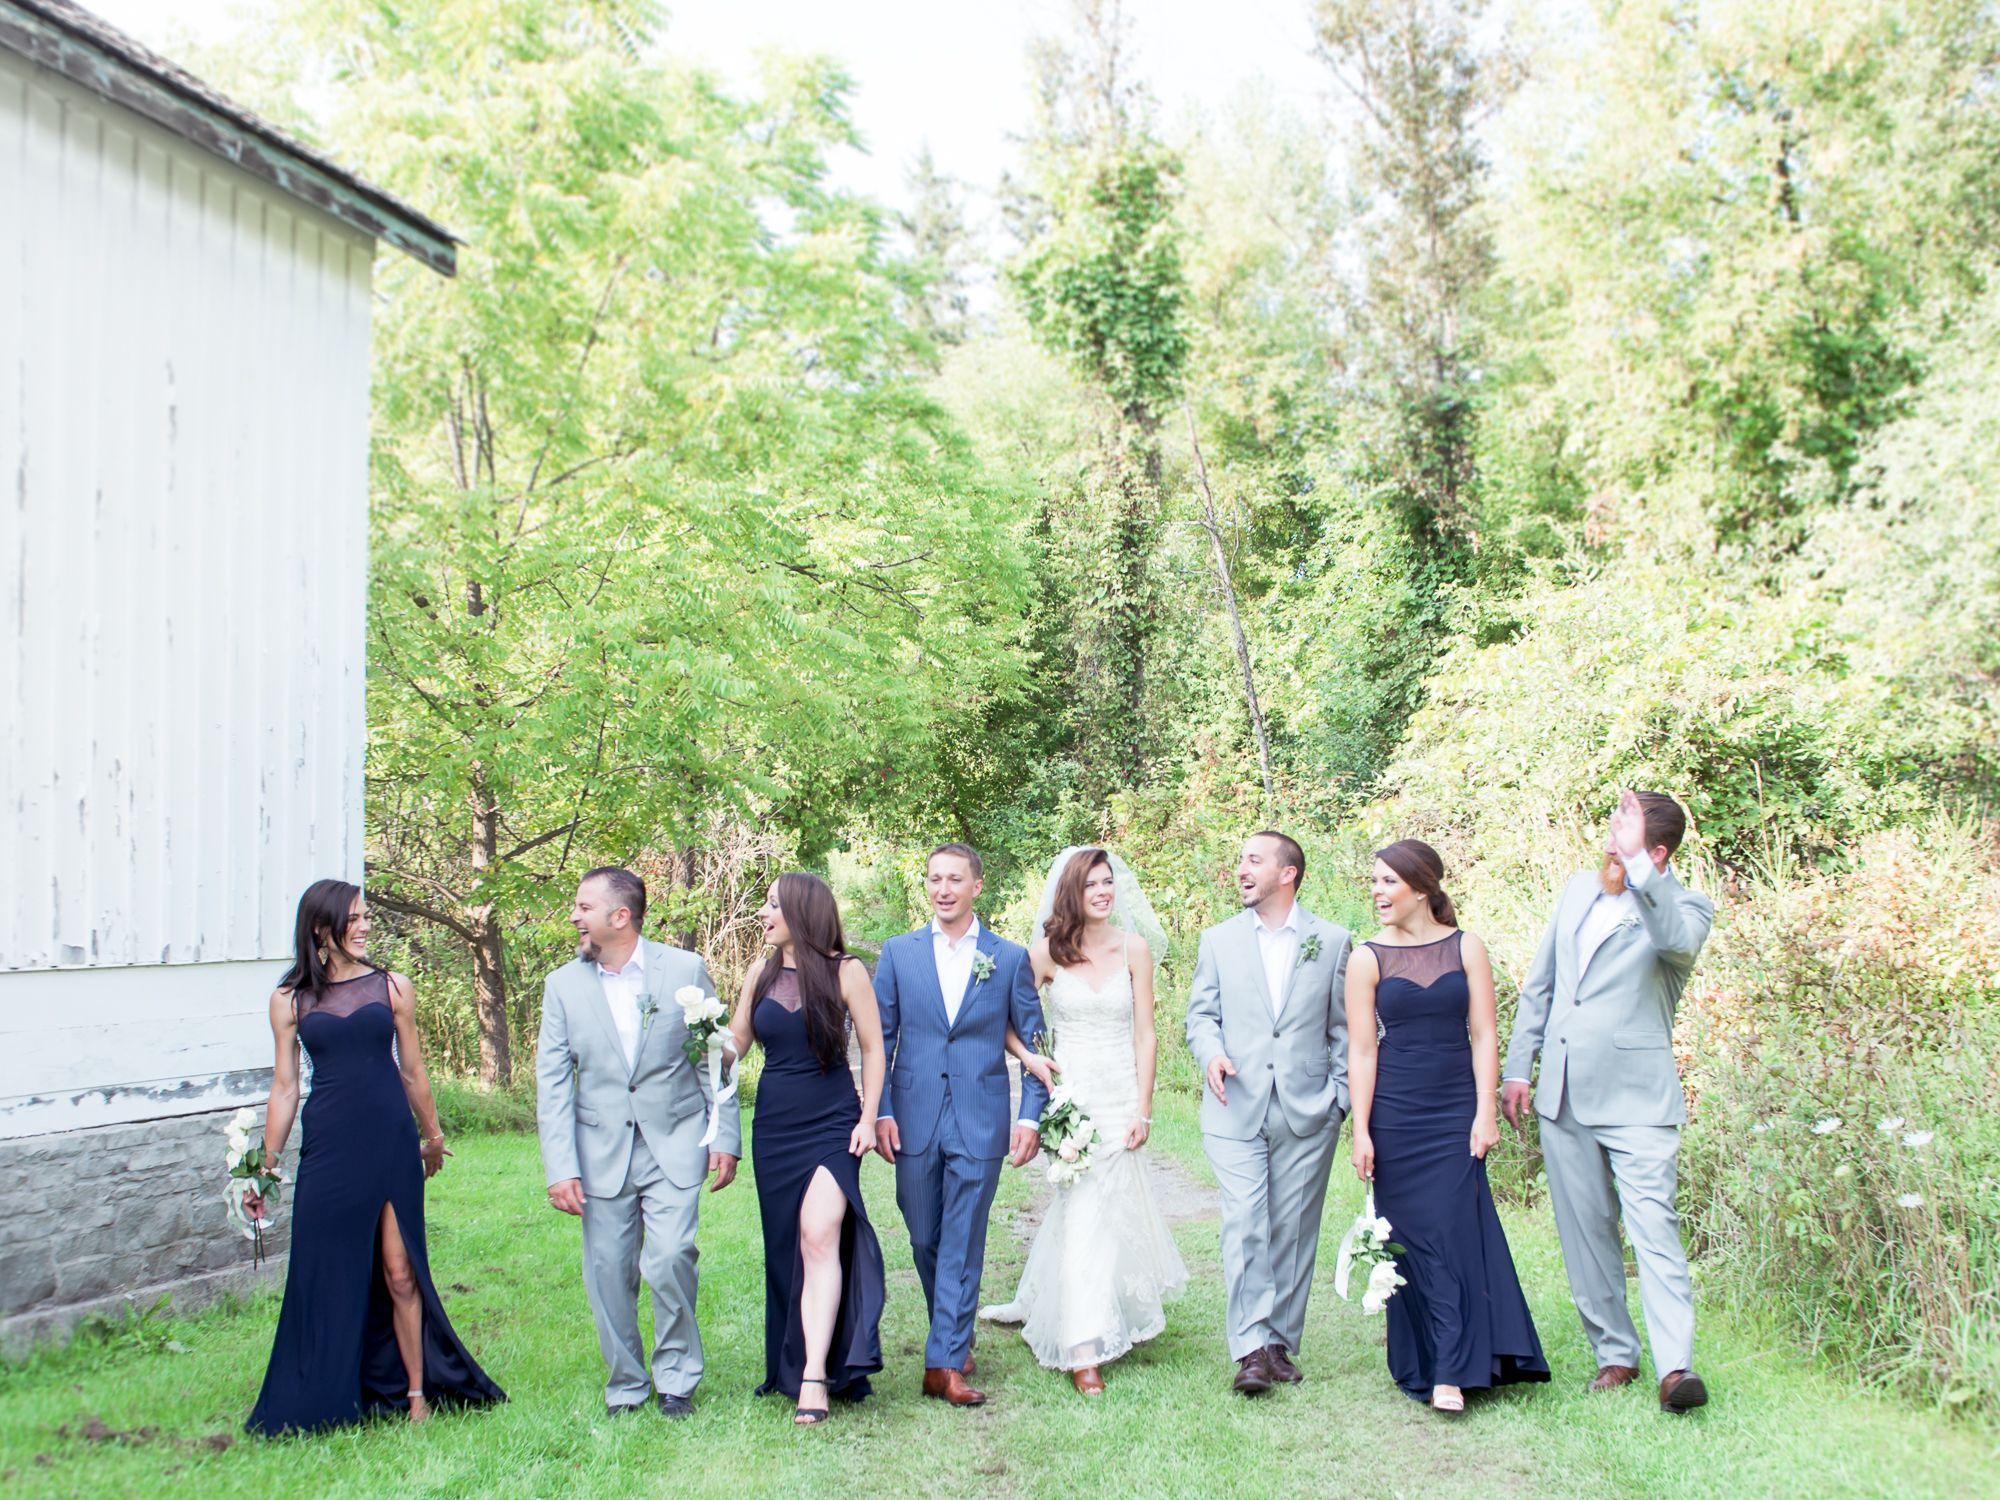 The Rustic Wedding – Part I forecast